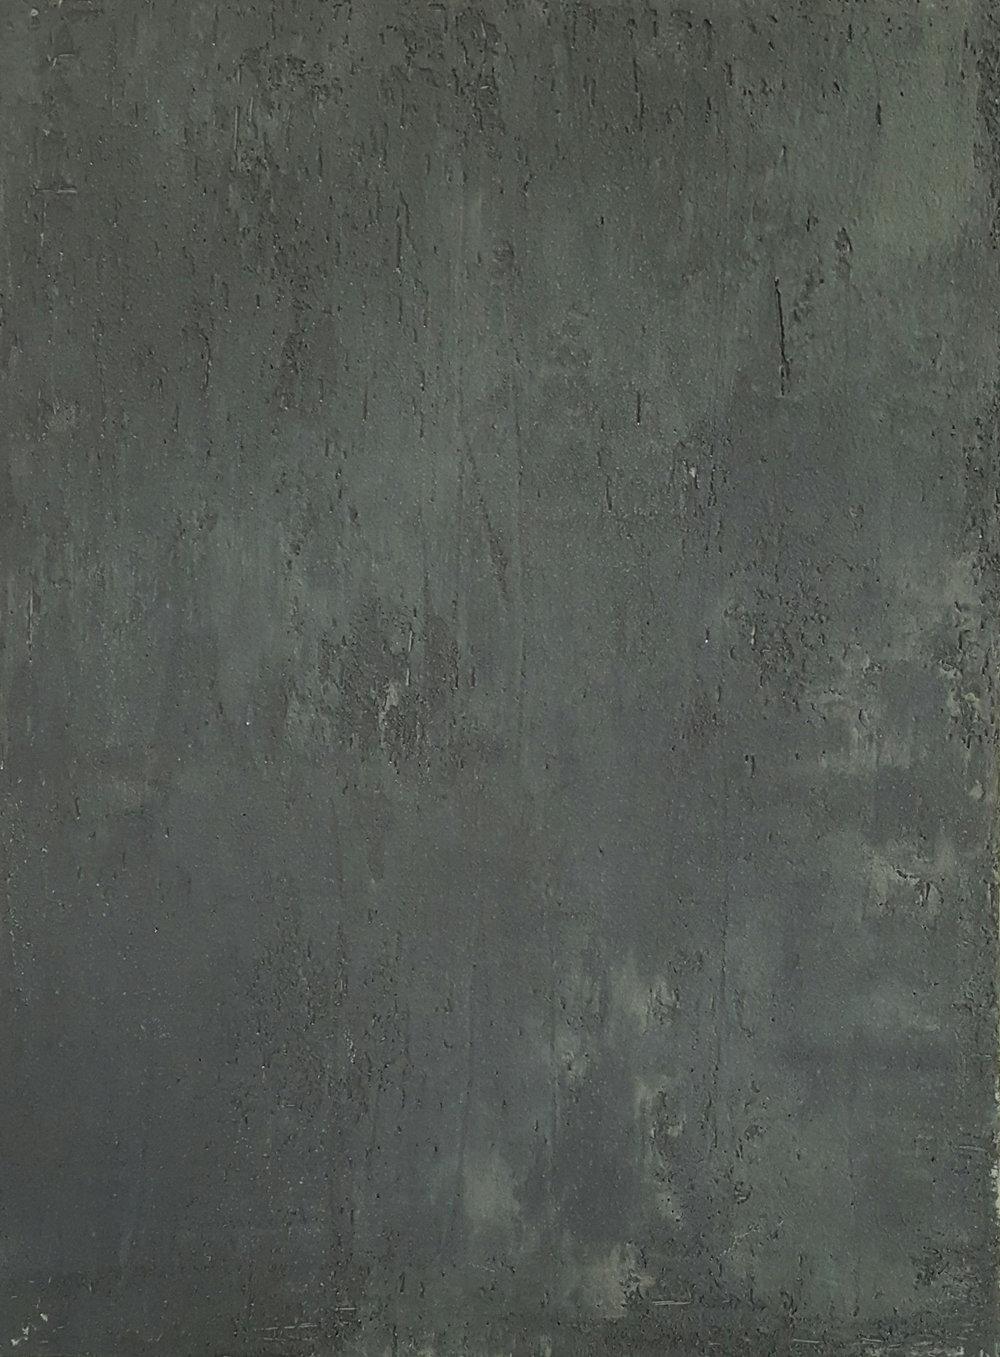 Adobe Texture - Off Black